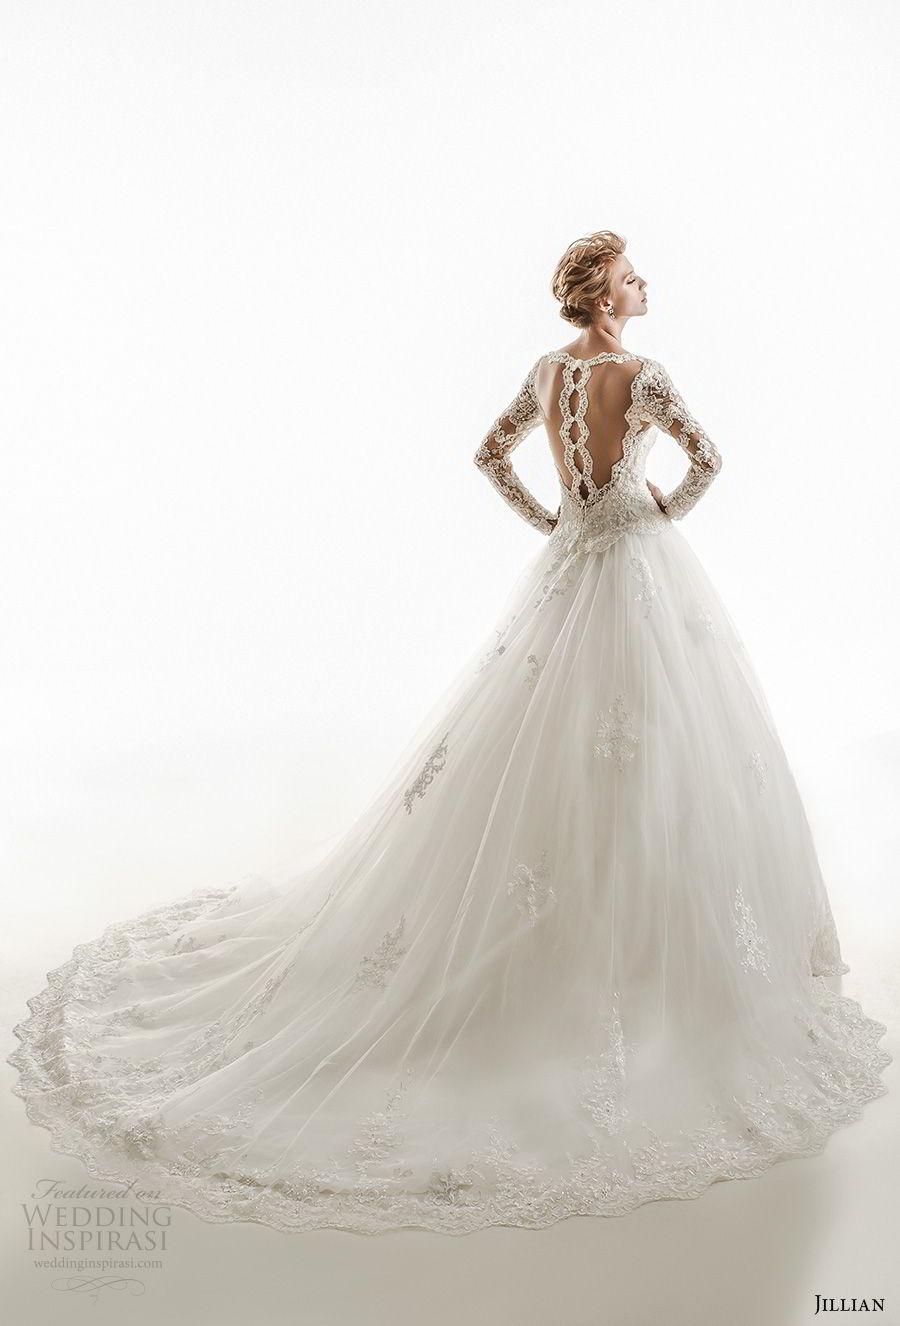 jillian 2018 bridal long sleeves v neck heavily embellished bodice elegant princess ball gown wedding dress sheer lace back royal train (25) bv